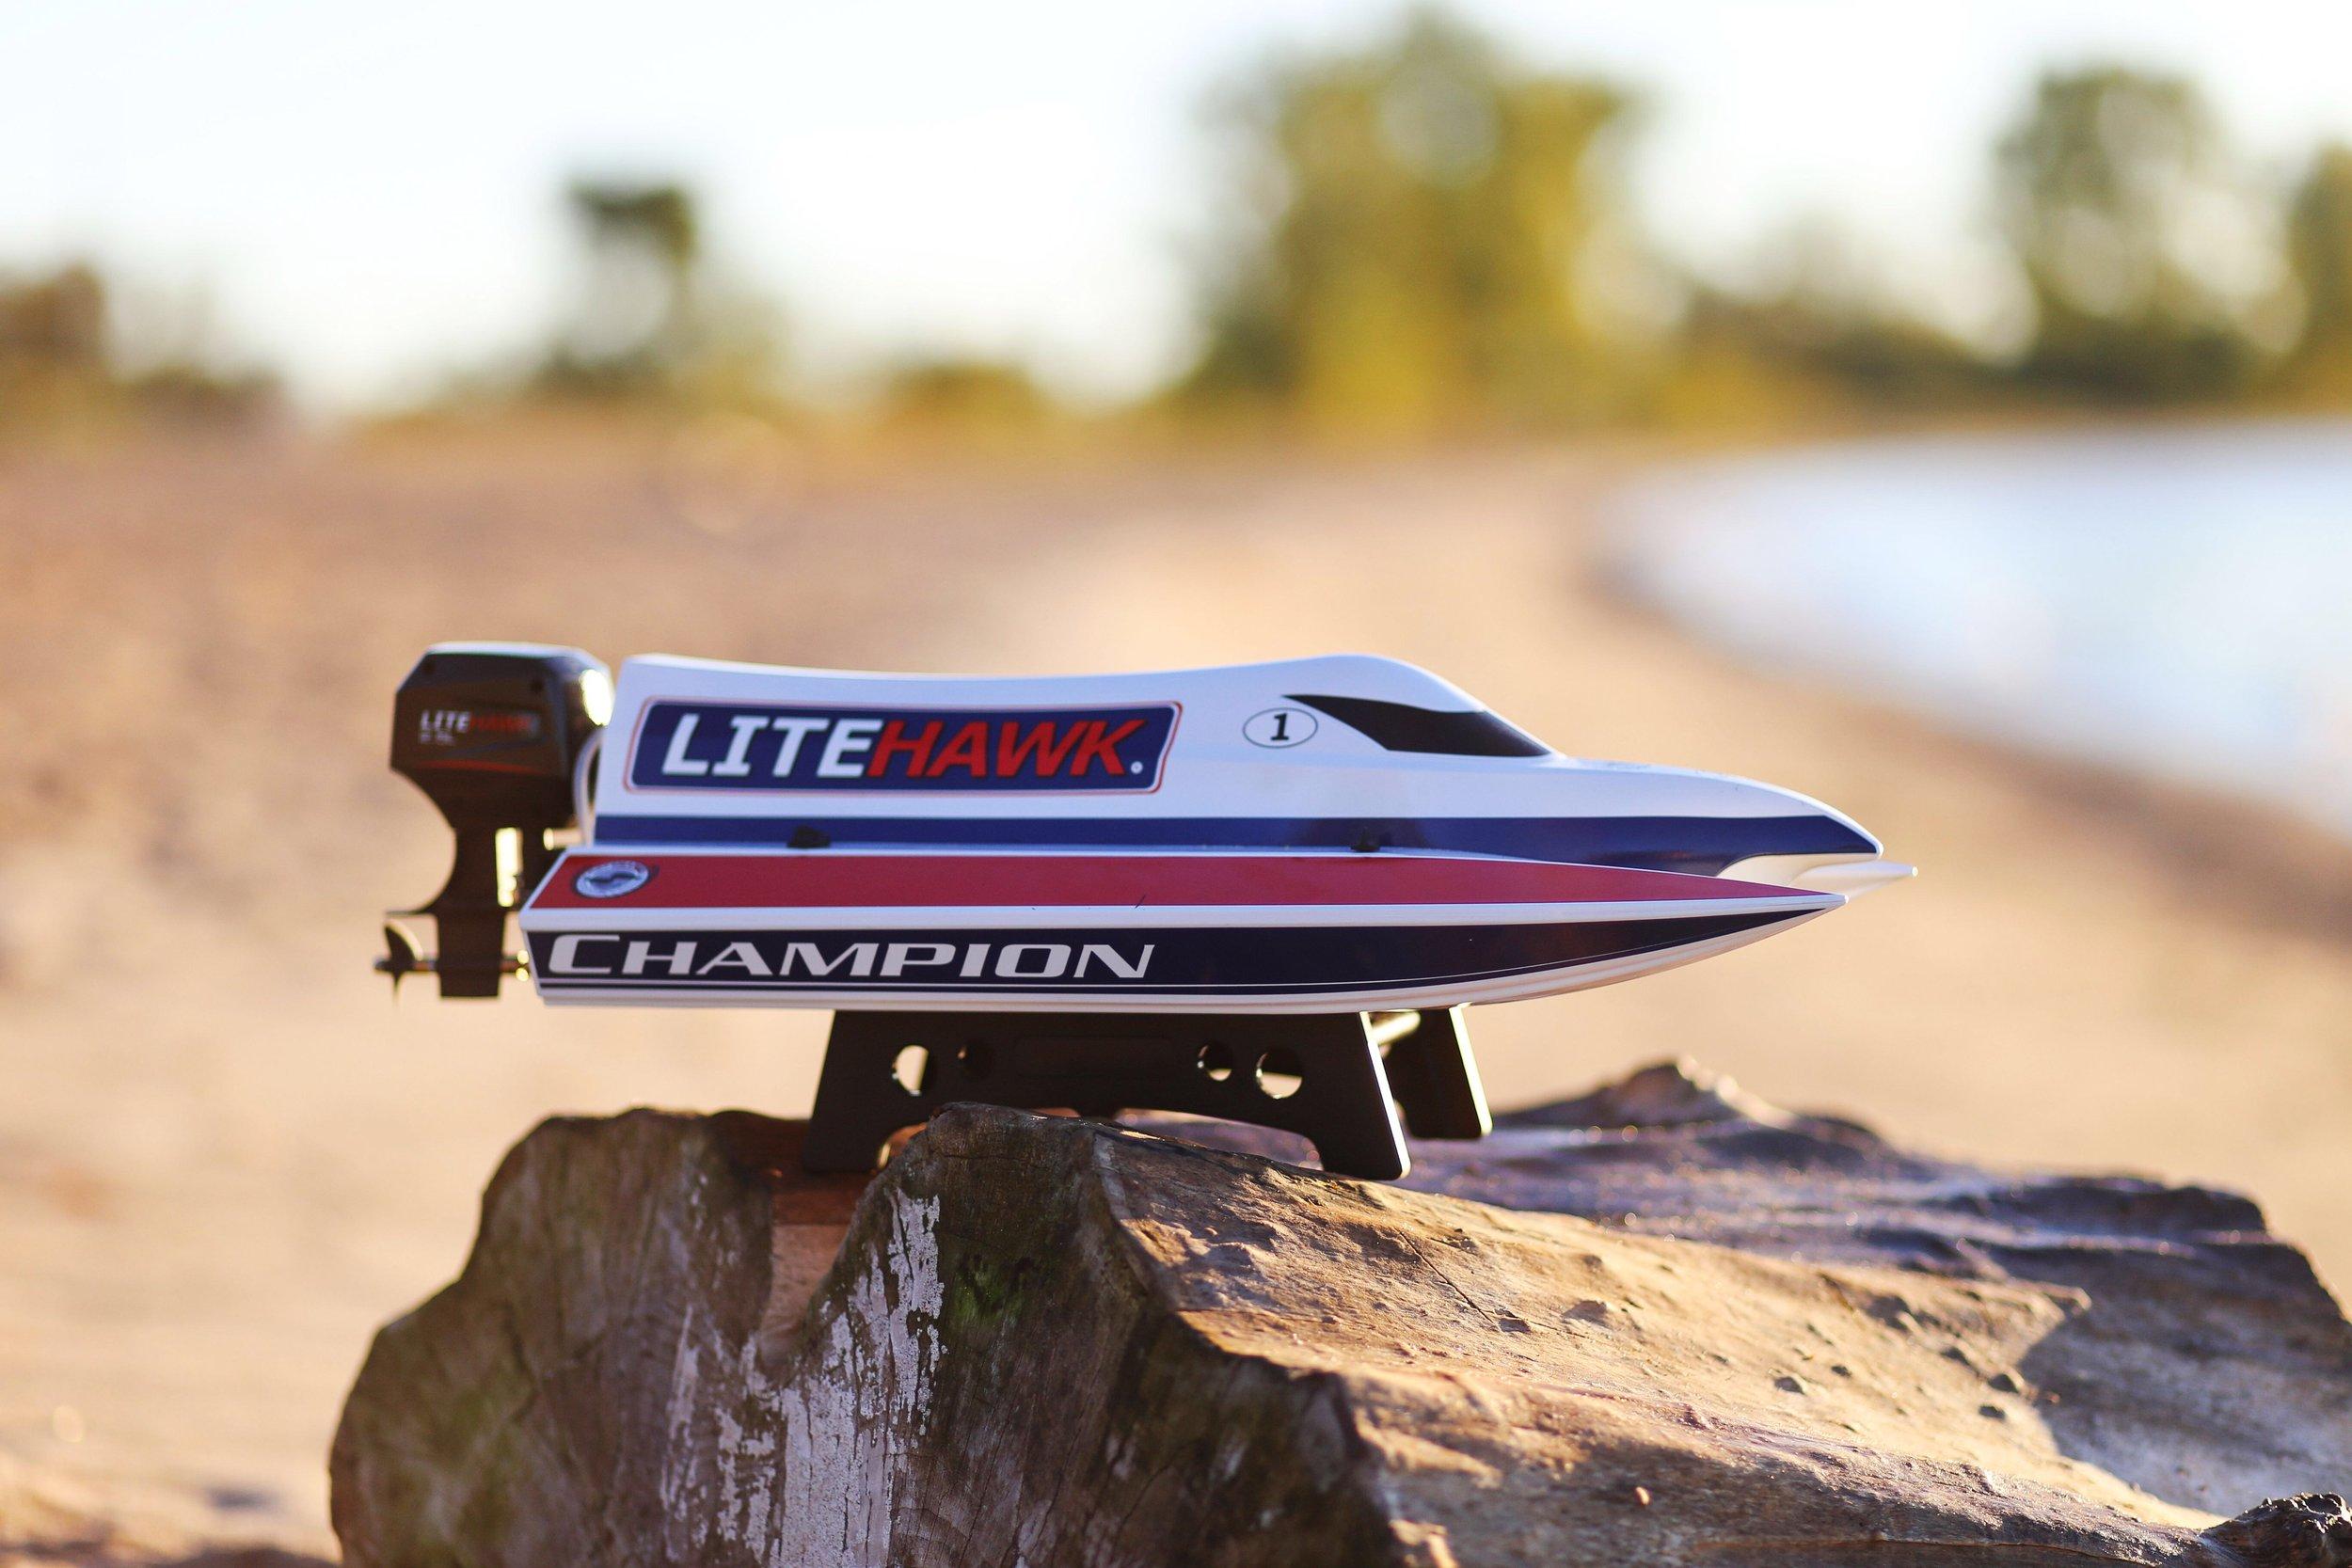 LiteHawk Champion (18).jpg